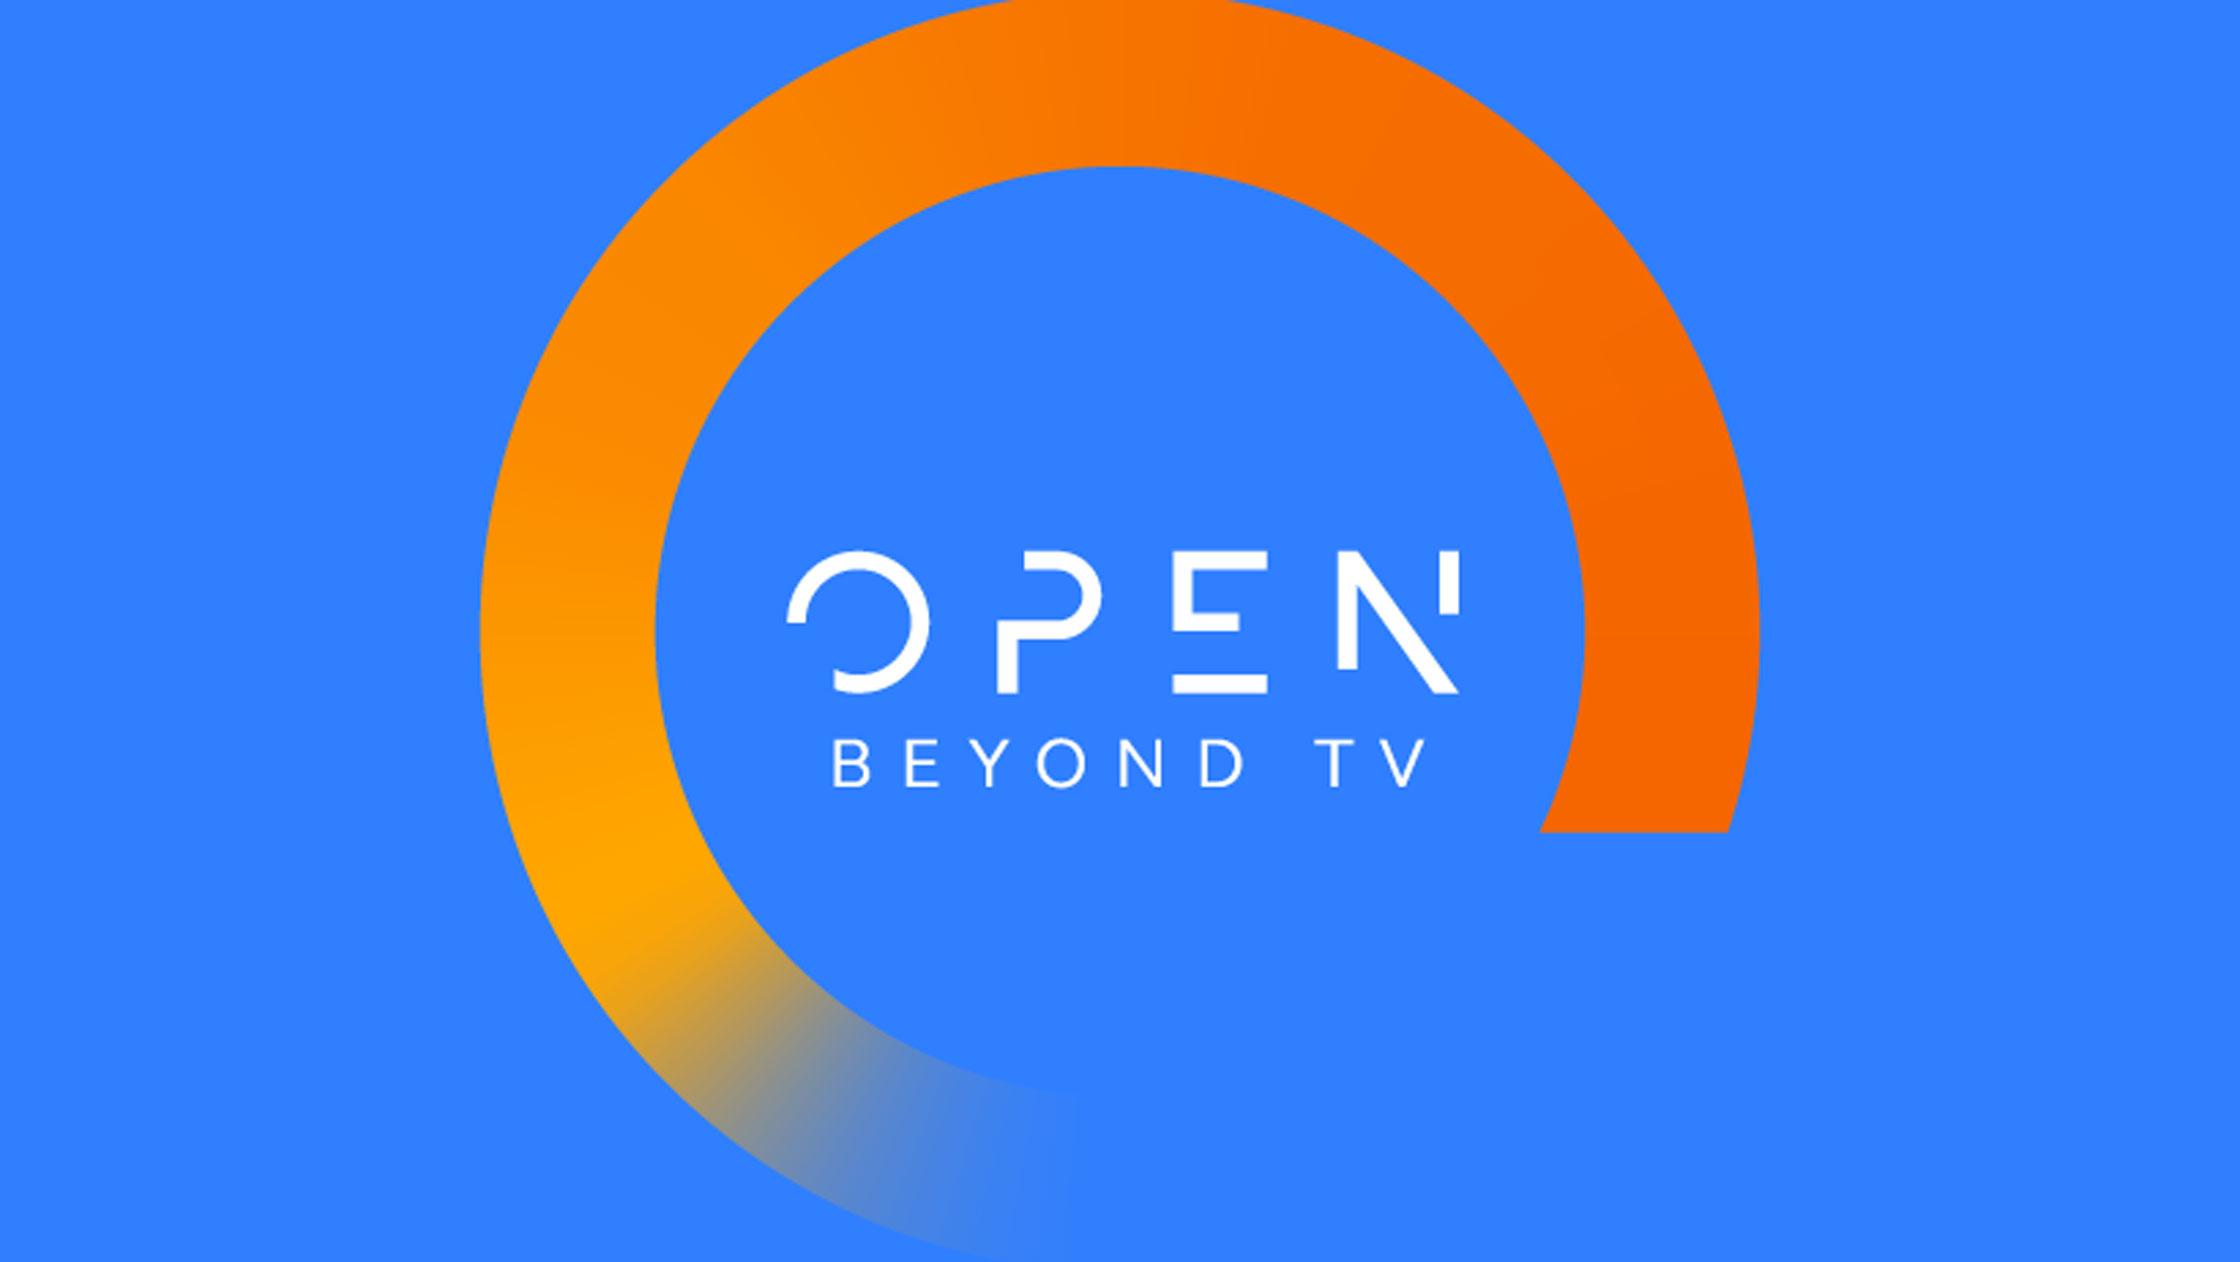 H Ακολουθία του Ακάθιστου Ύμνου από την Υβριδική Τηλεόραση του OPEN